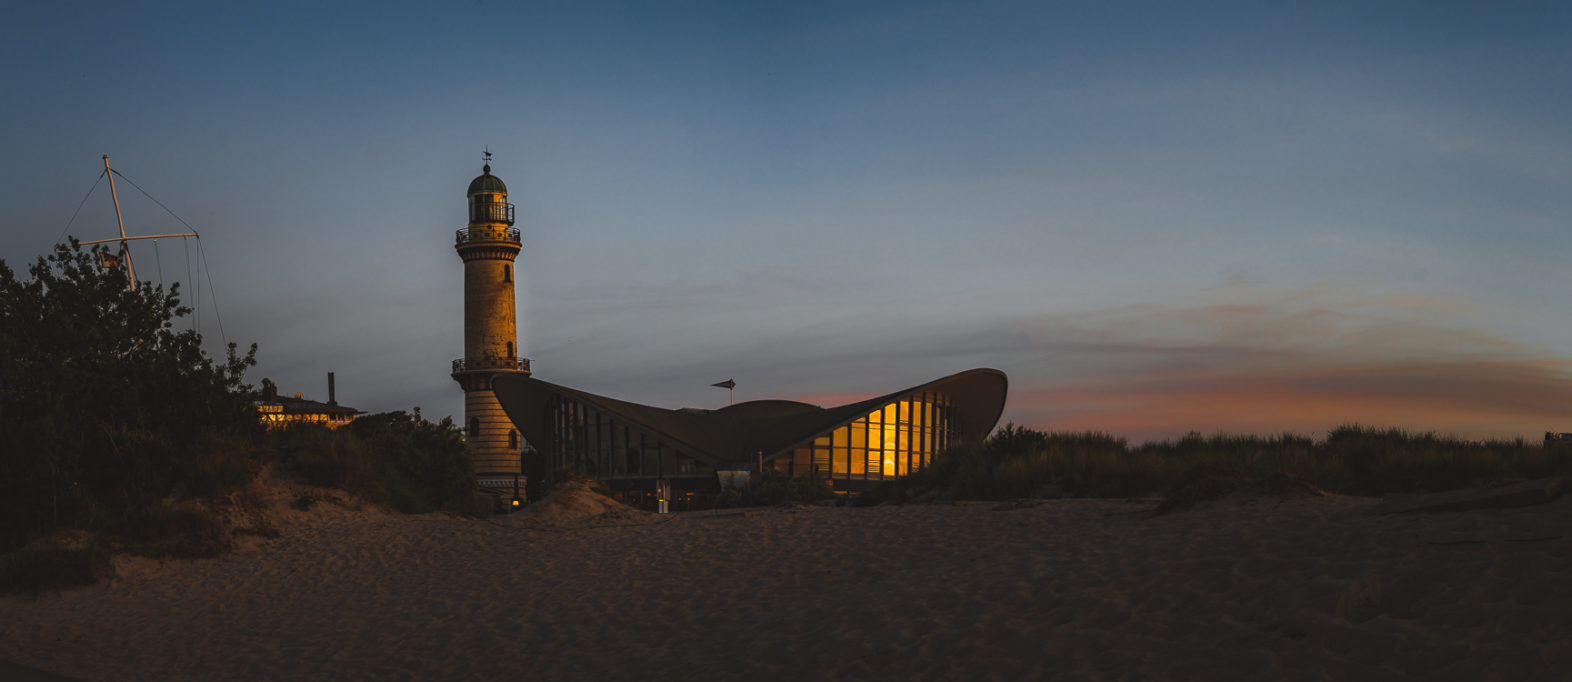 Teepott Leuchtturm Warnemünde Rostock